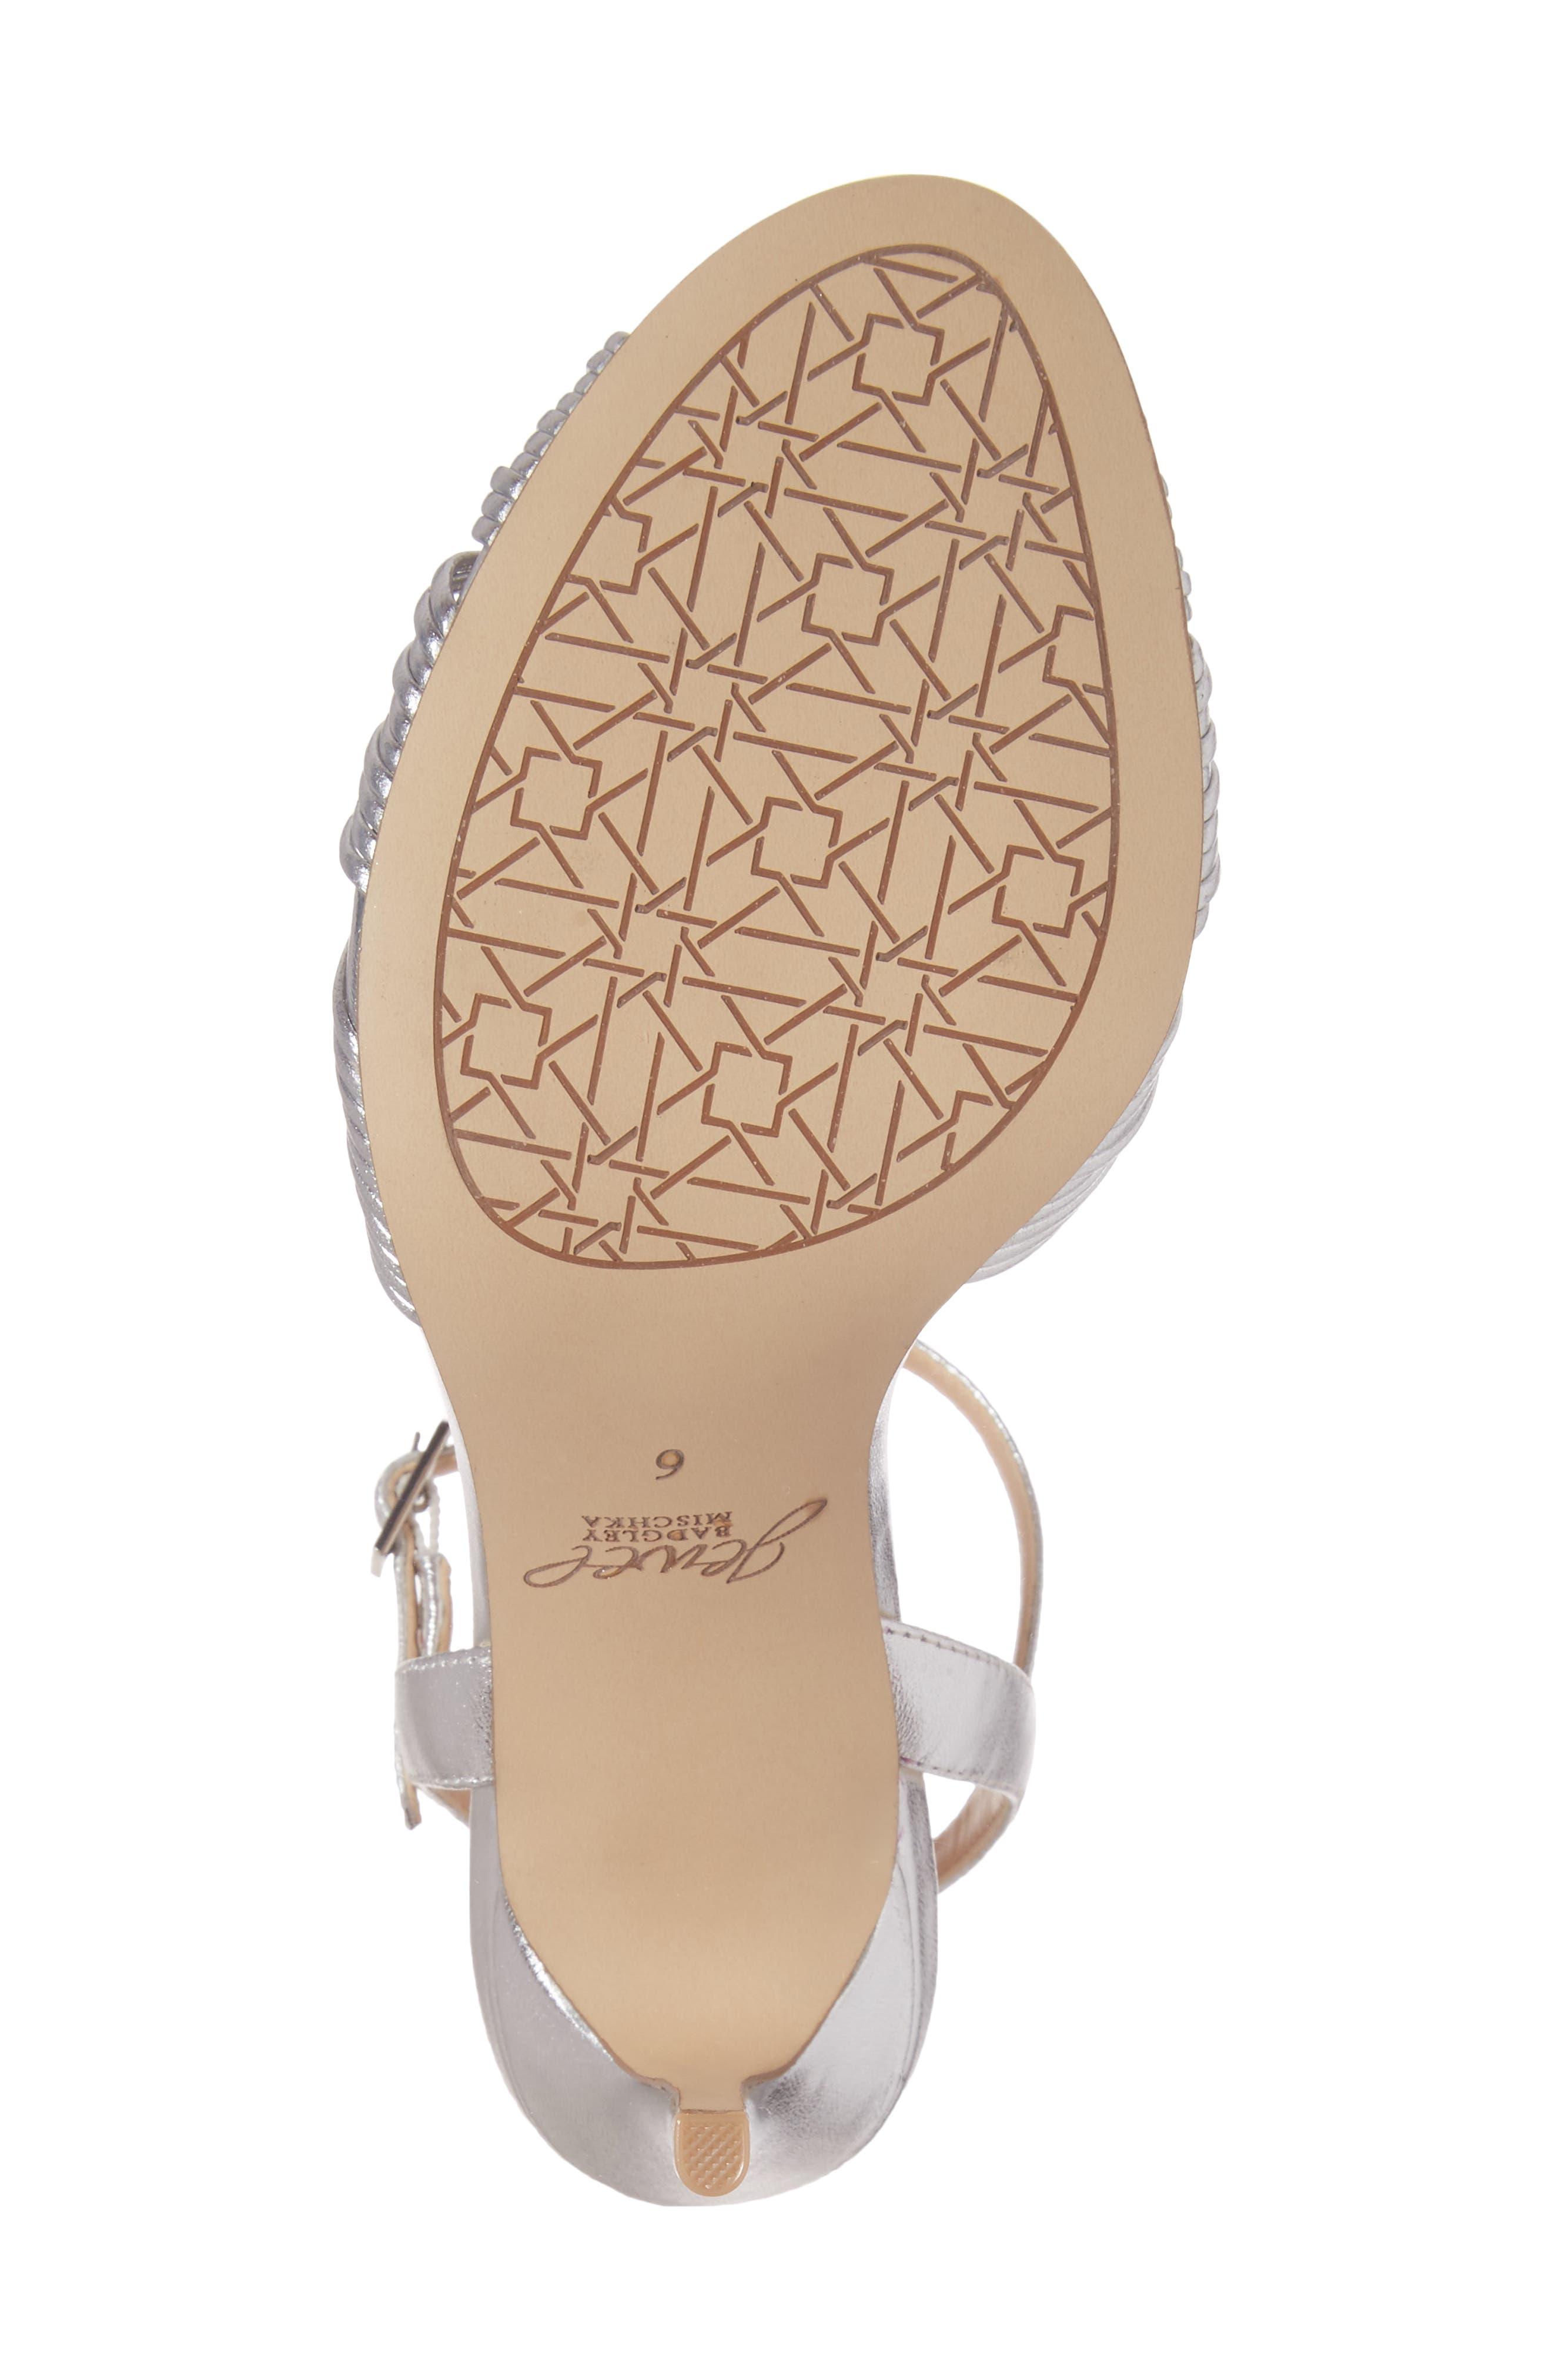 Lady Ankle Strap Sandal,                             Alternate thumbnail 6, color,                             046